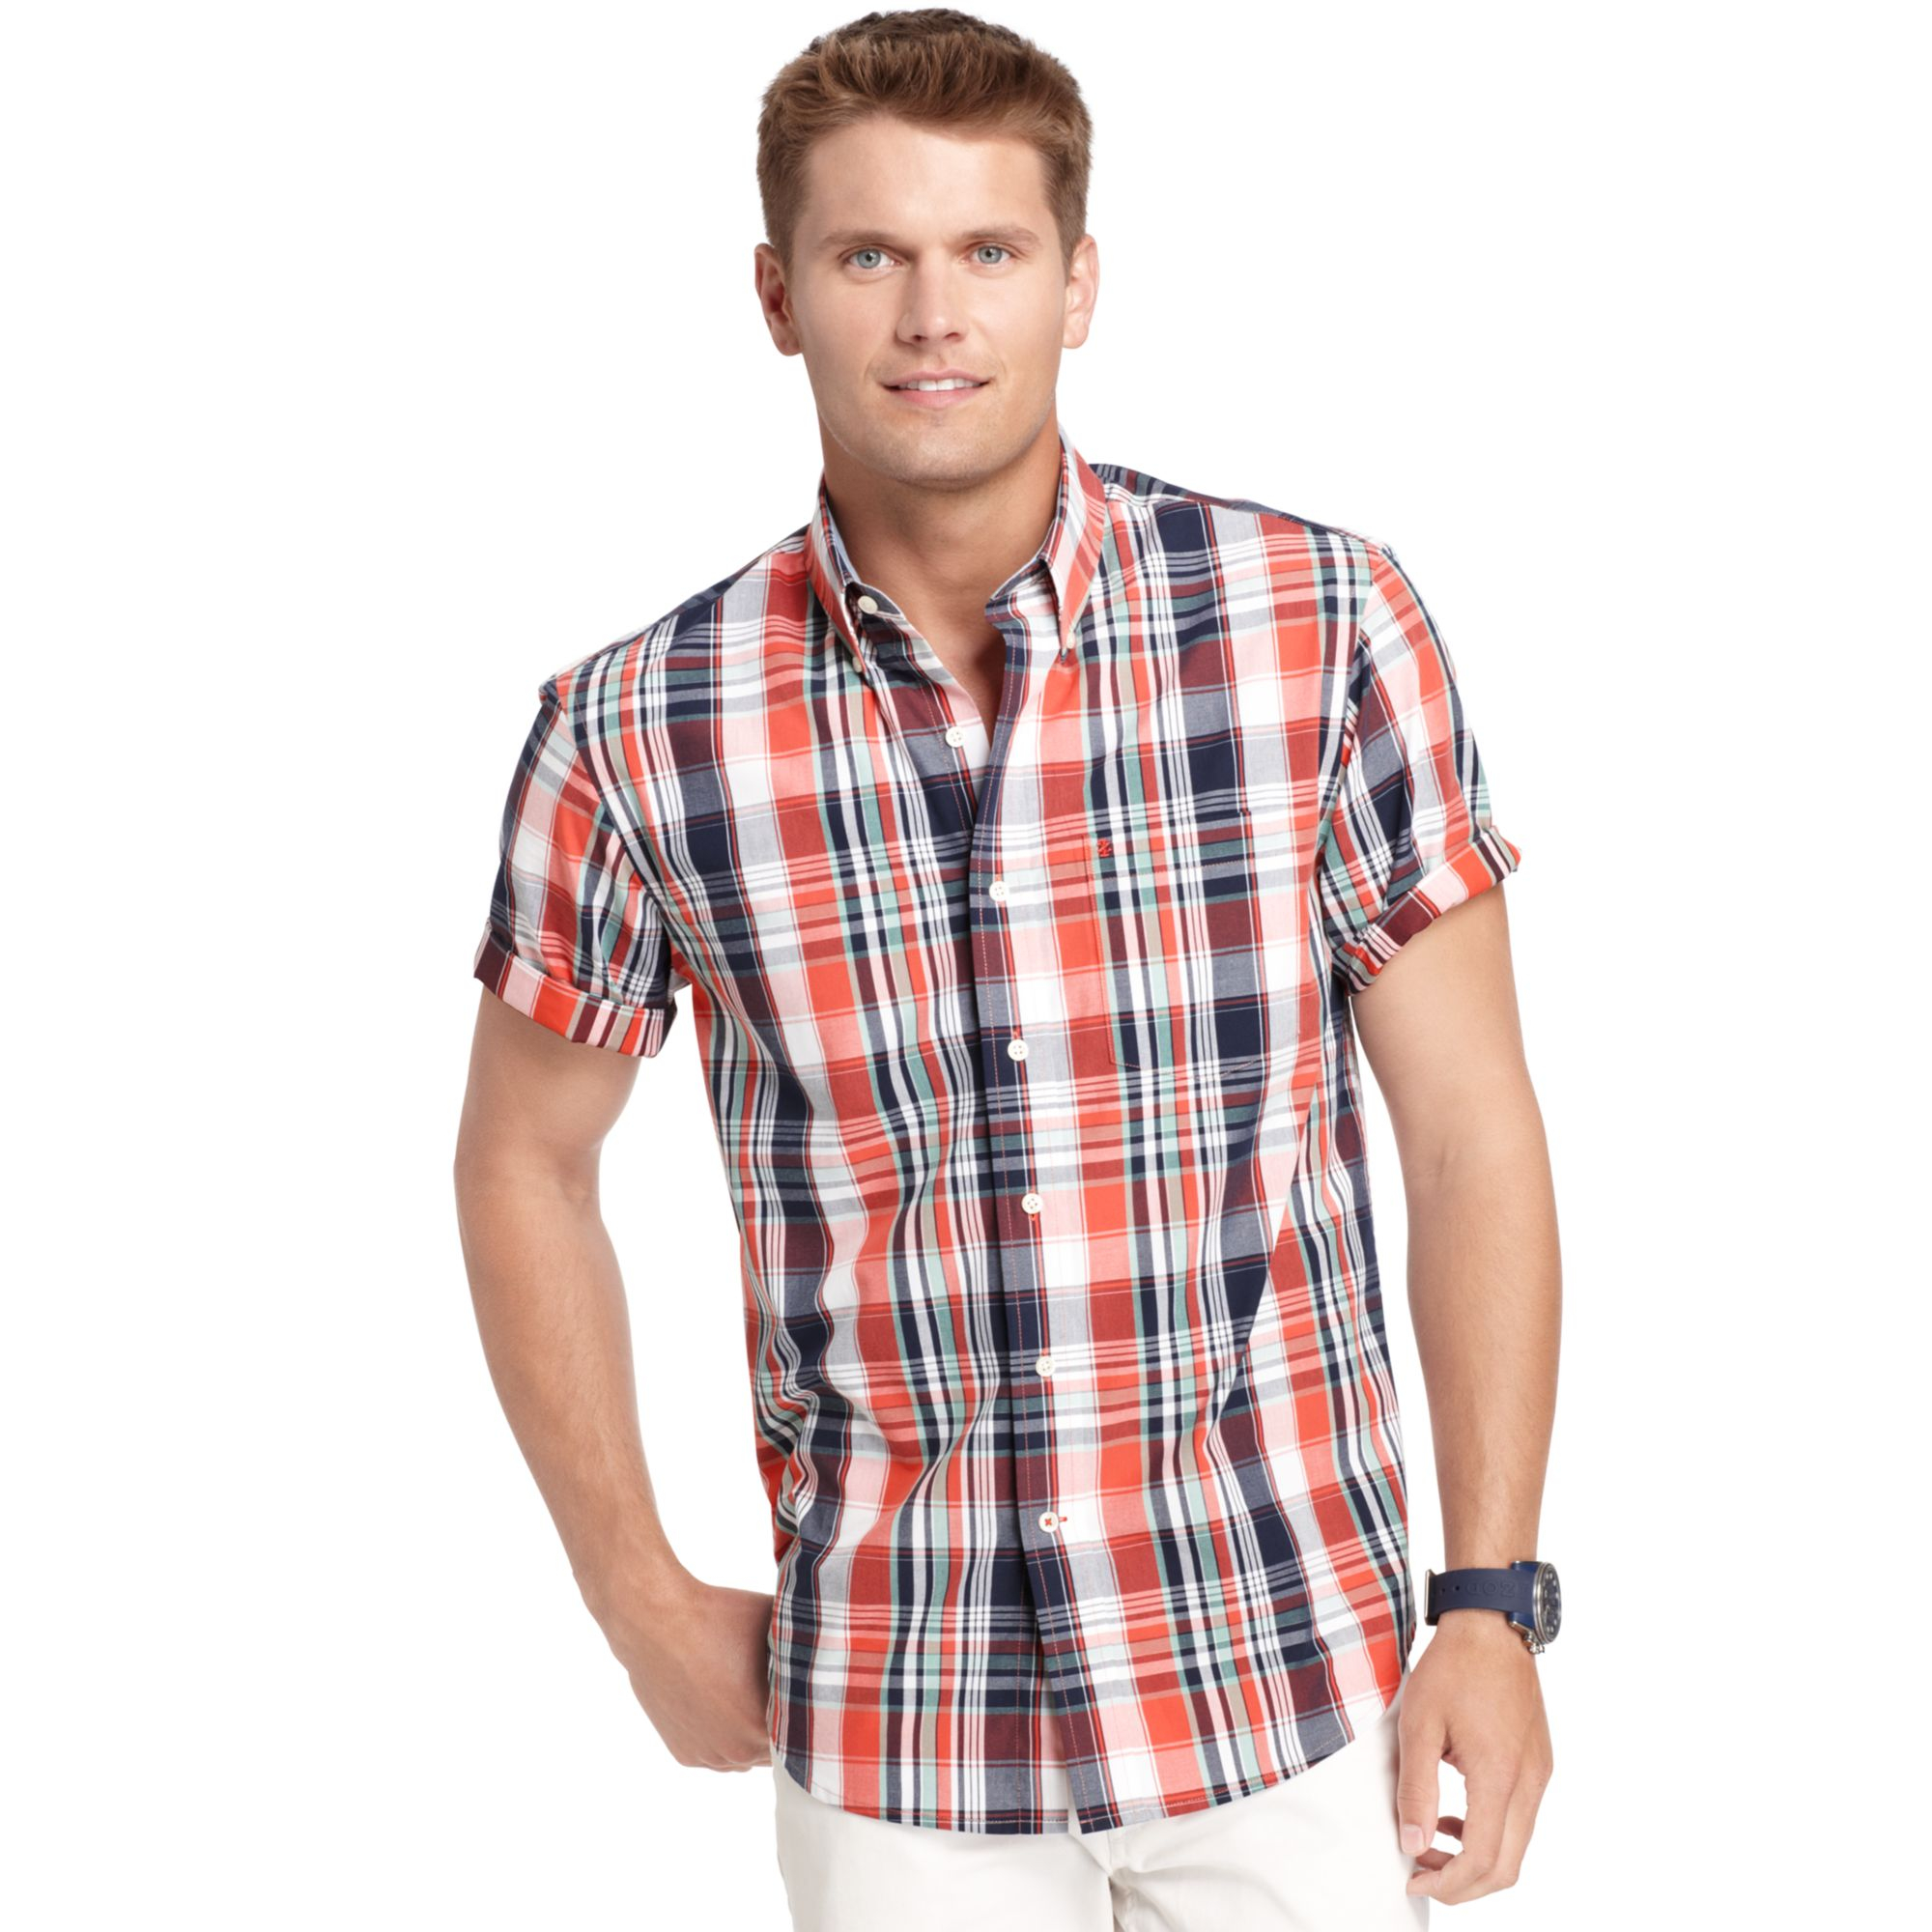 Izod big and tall short sleeve plaid shirt in red for men for Izod big and tall shirts